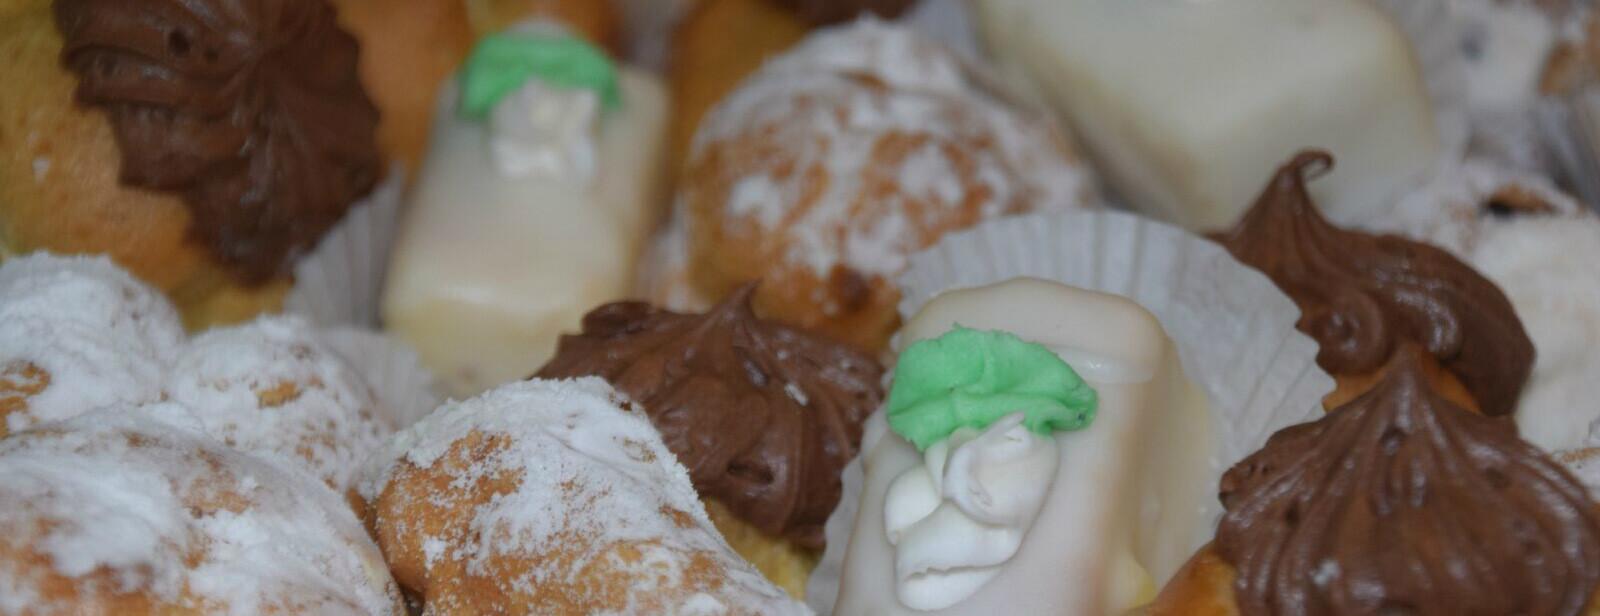 Desserts By Design  Wel e to Desserts By Design Richboro PA